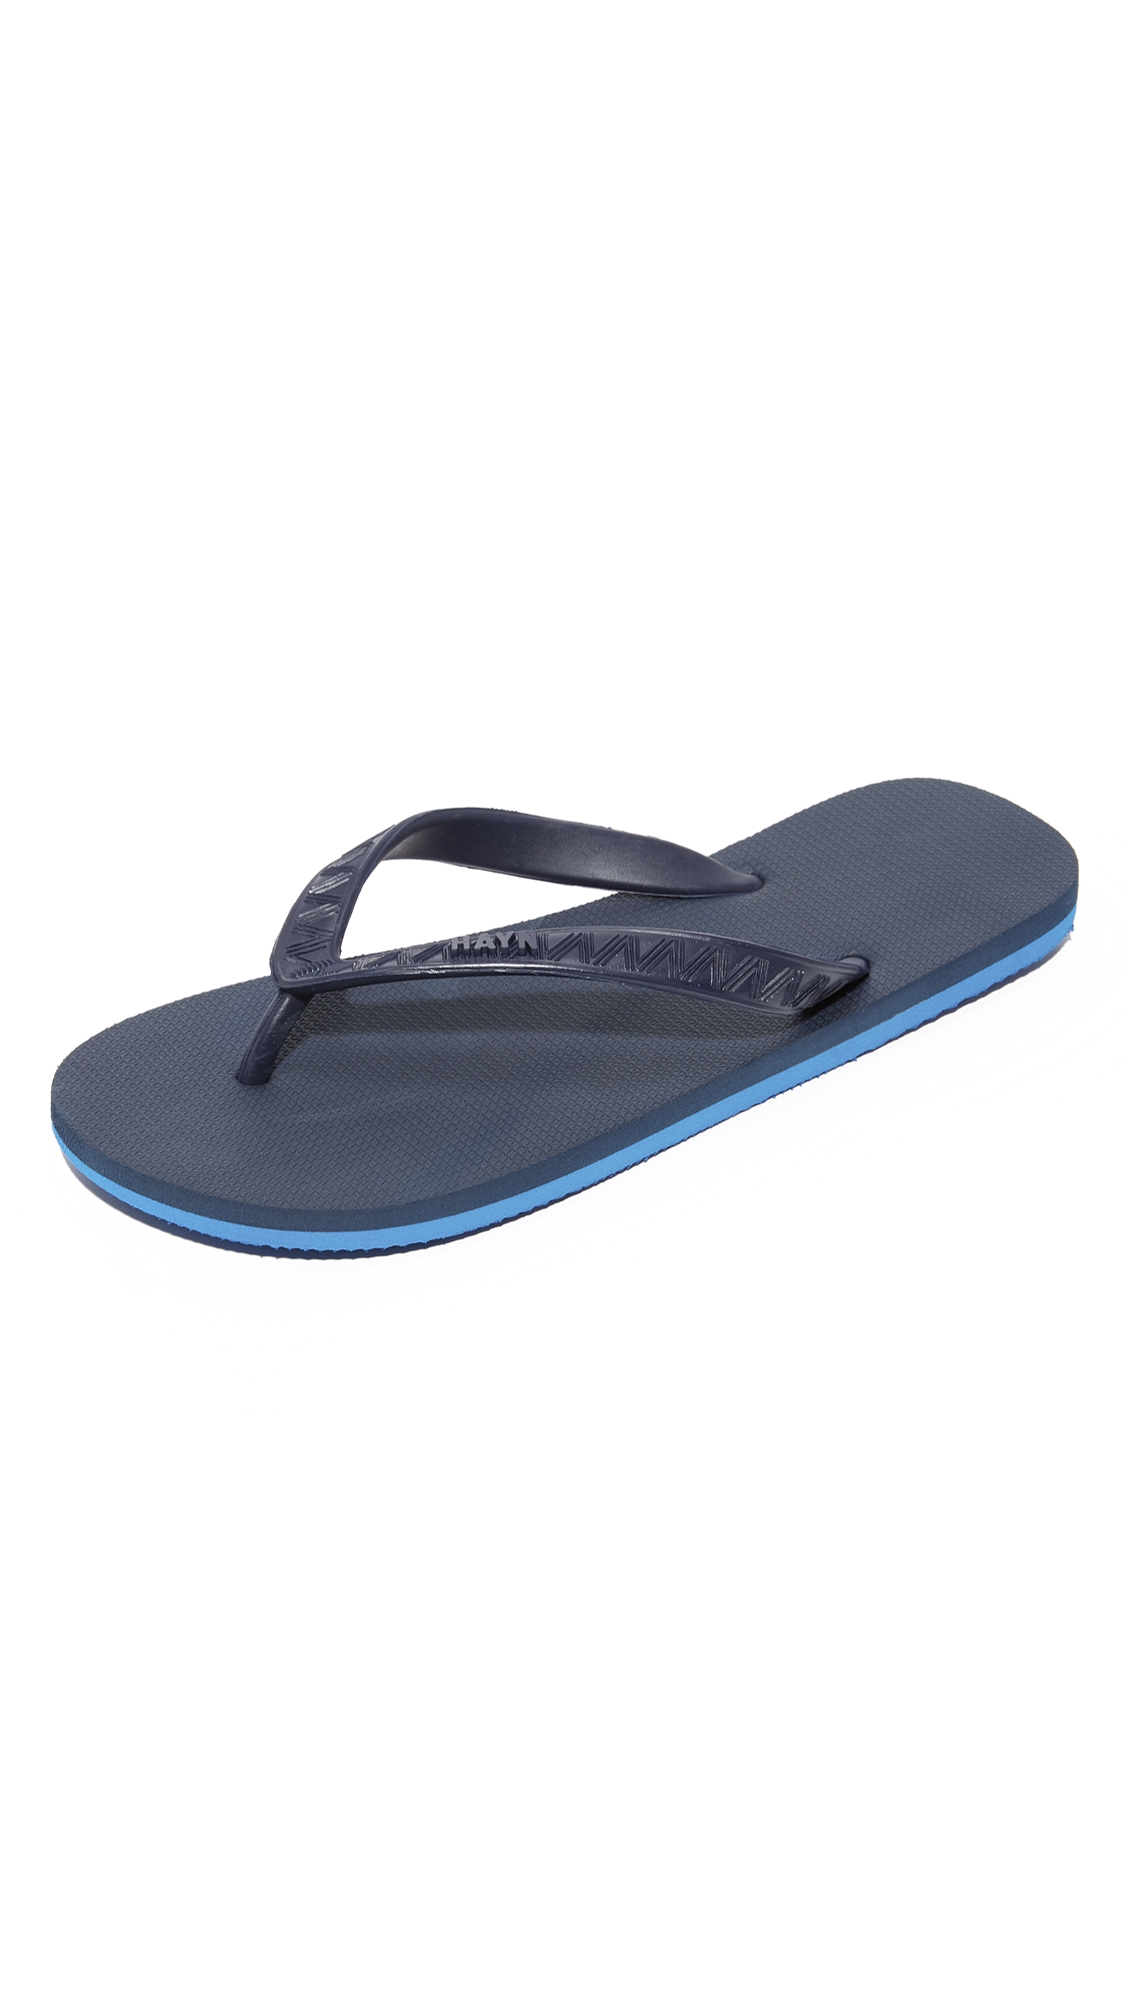 HAYN Makapuu Sandals